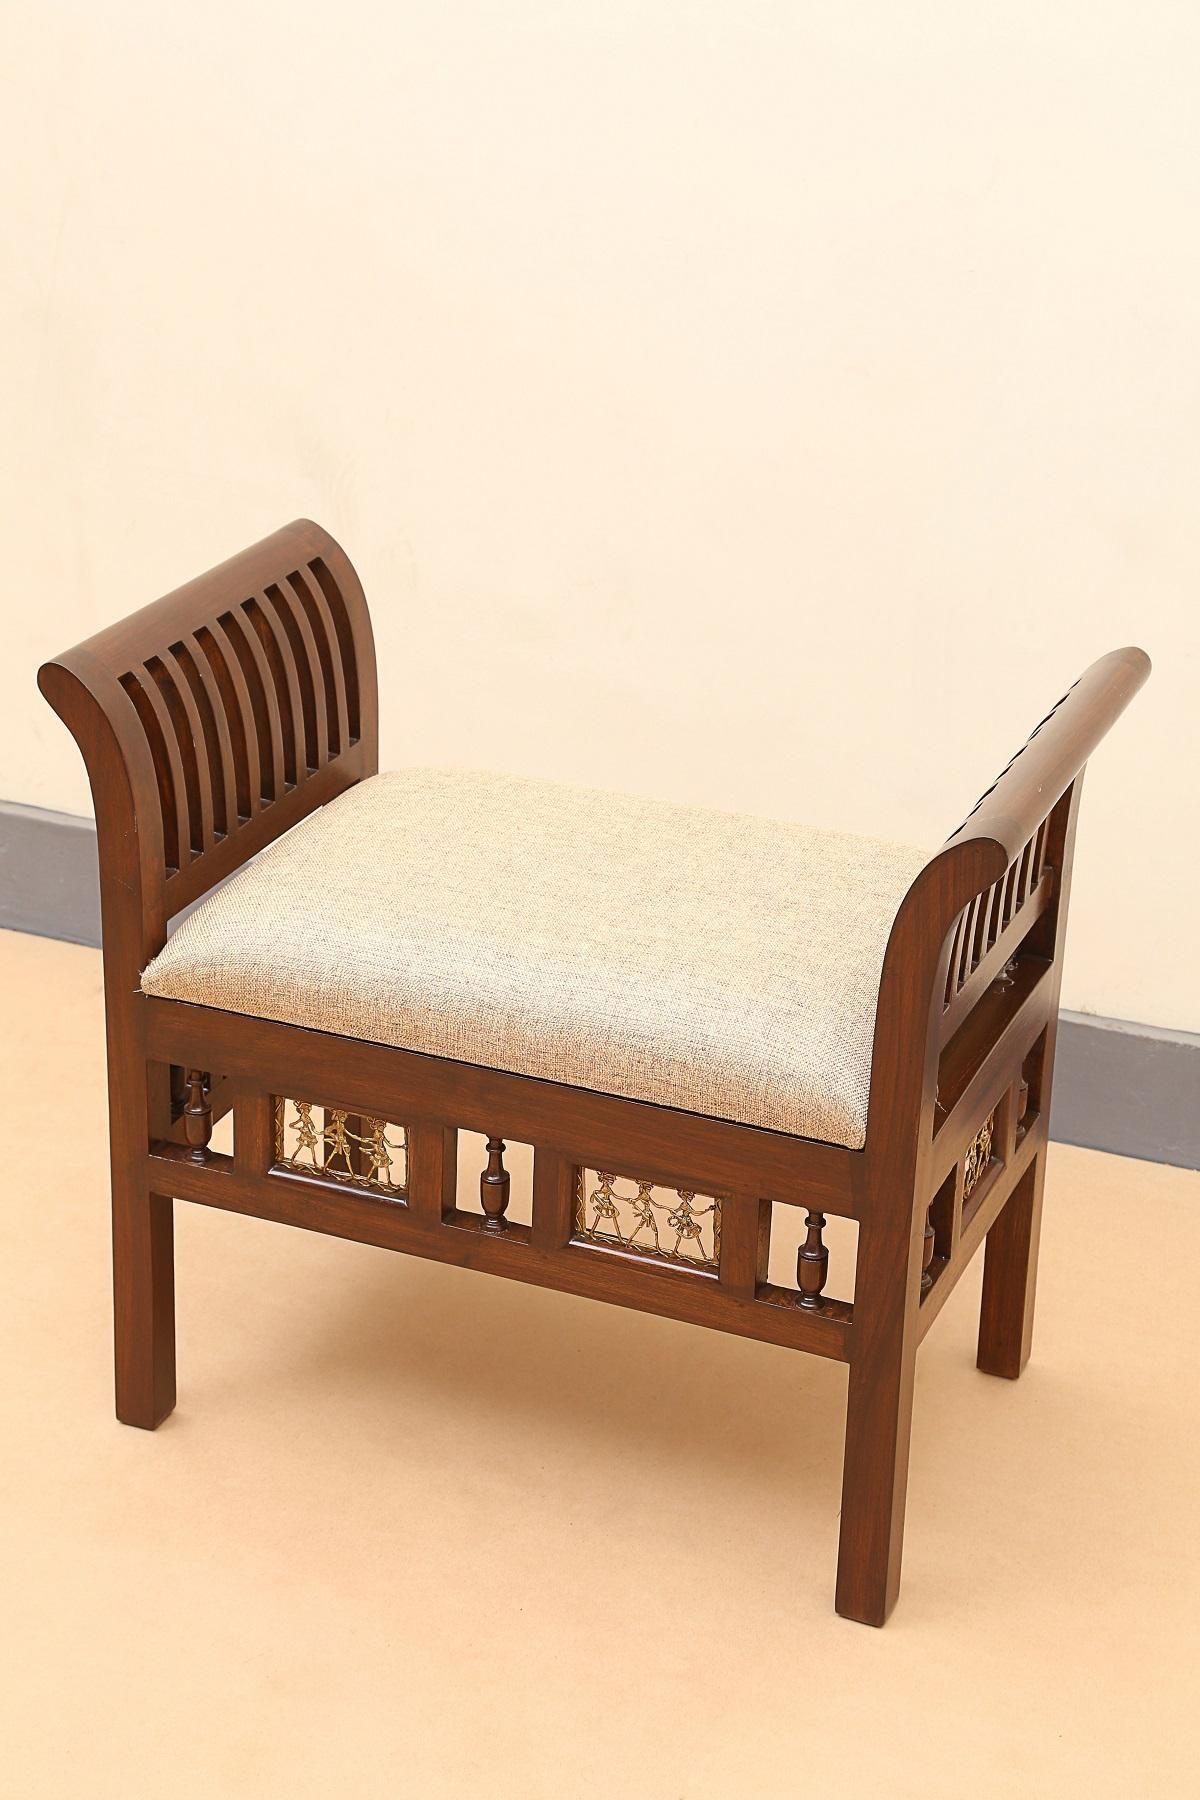 Pin By Gloria Eugenia Callejas Gomez On Muebles In 2020 Wooden Sofa Designs Home Entrance Decor Wooden Sofa